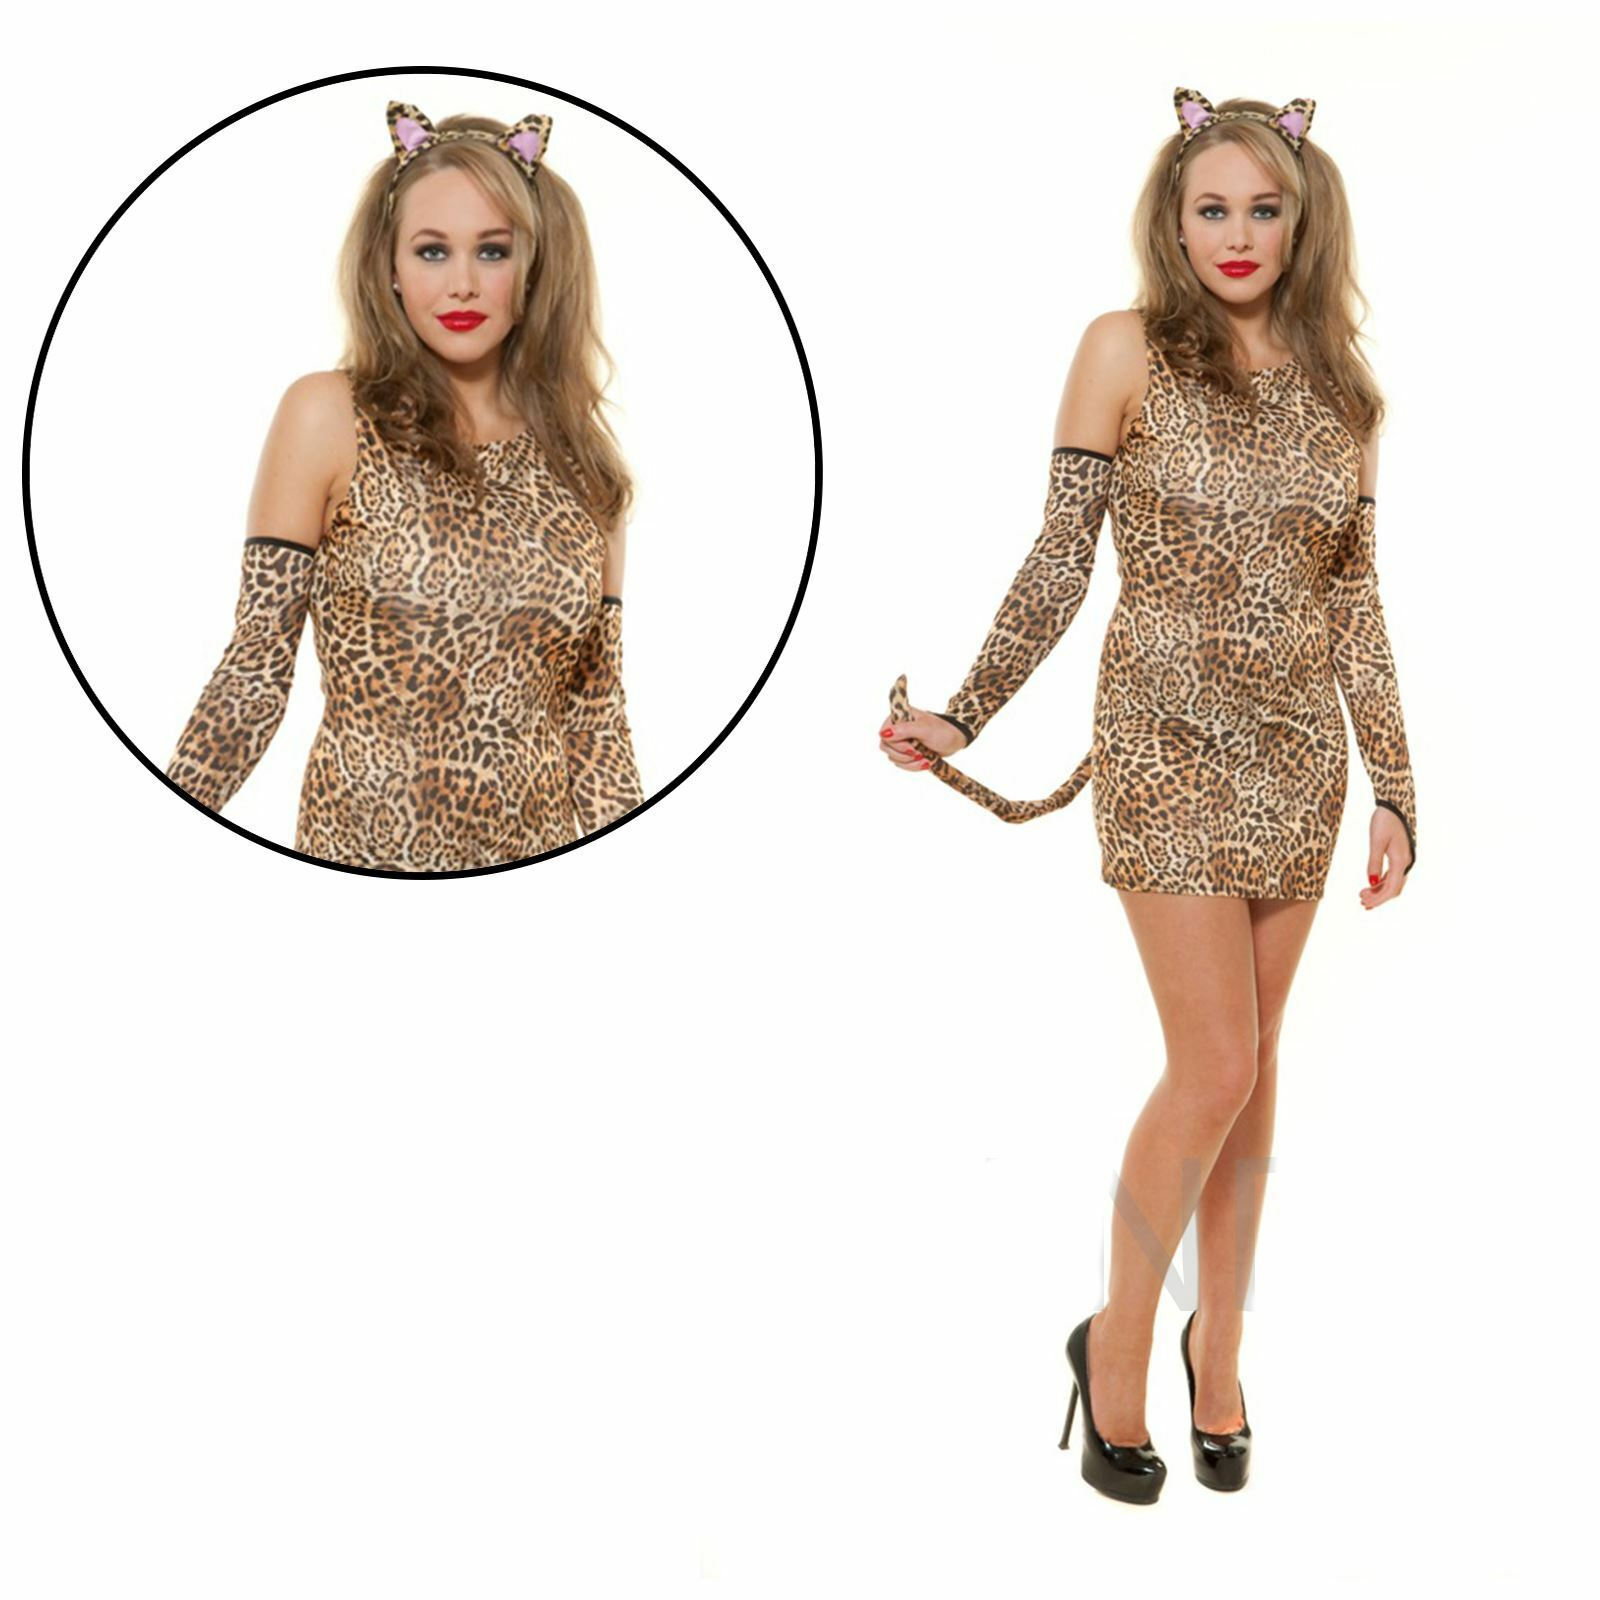 WOMAN/ANIMALS/LEOPARD DRESS